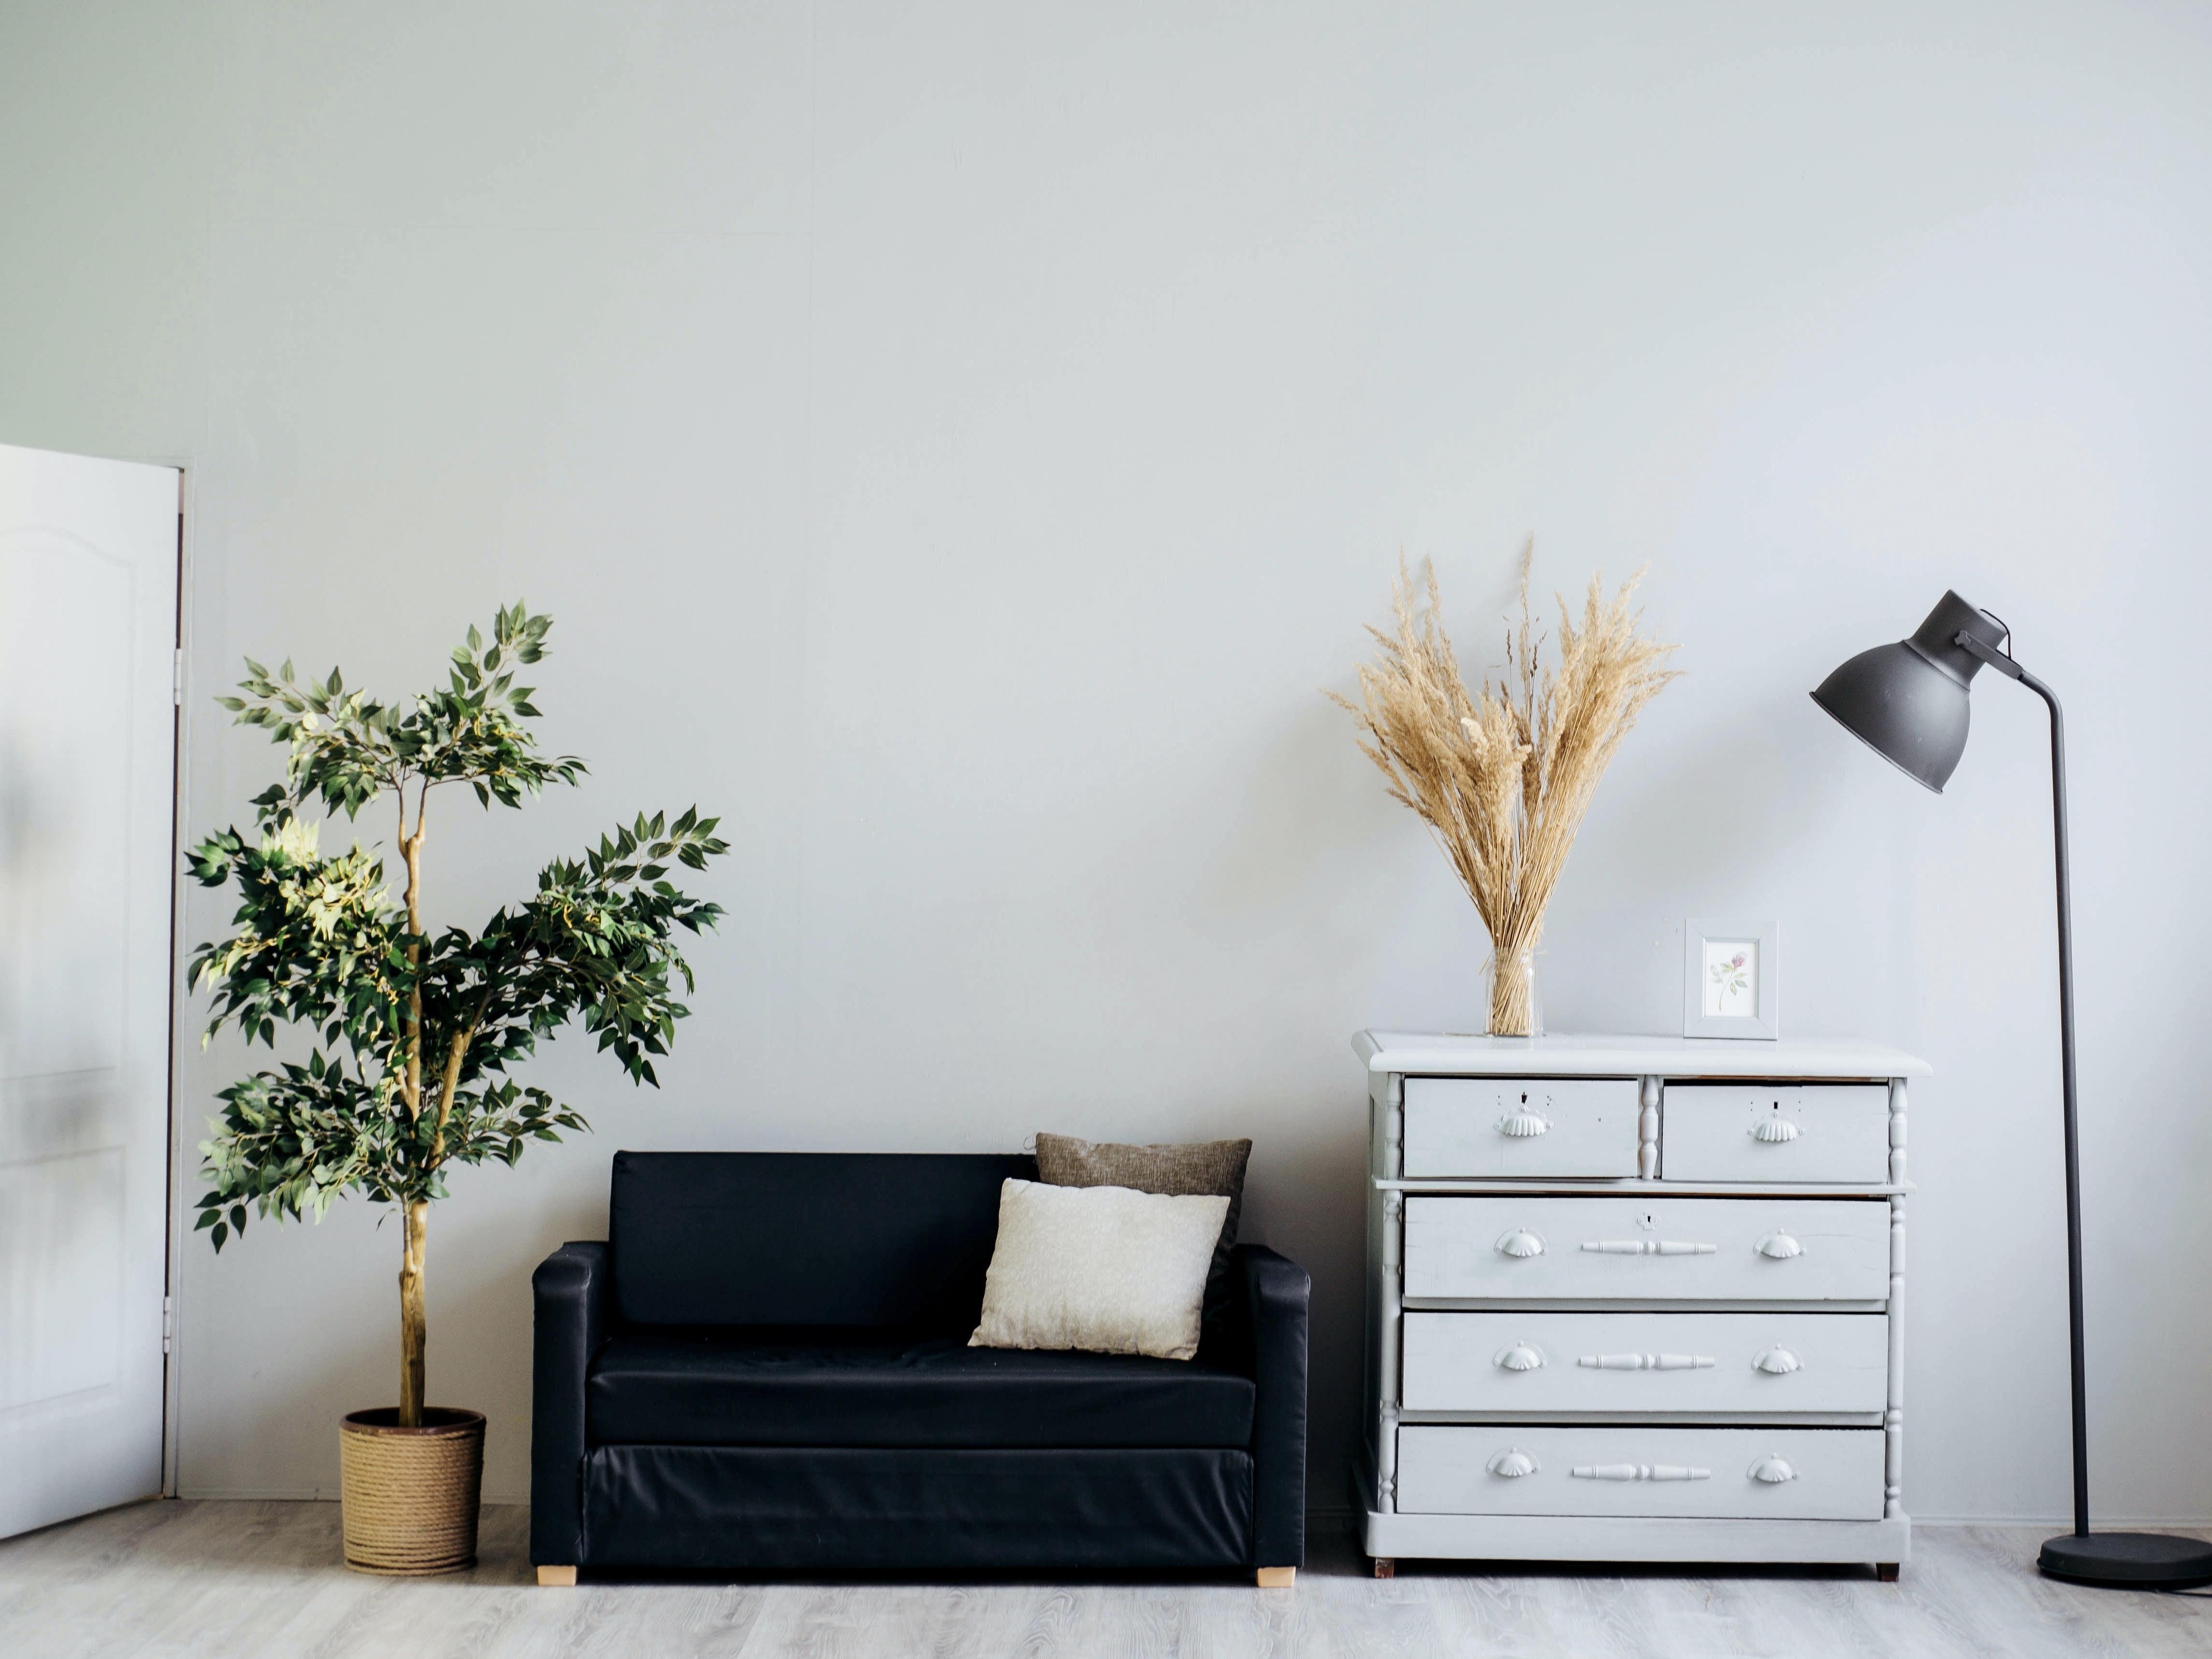 Cozy room. Image Credit: Alexandra Gorn/Unsplash